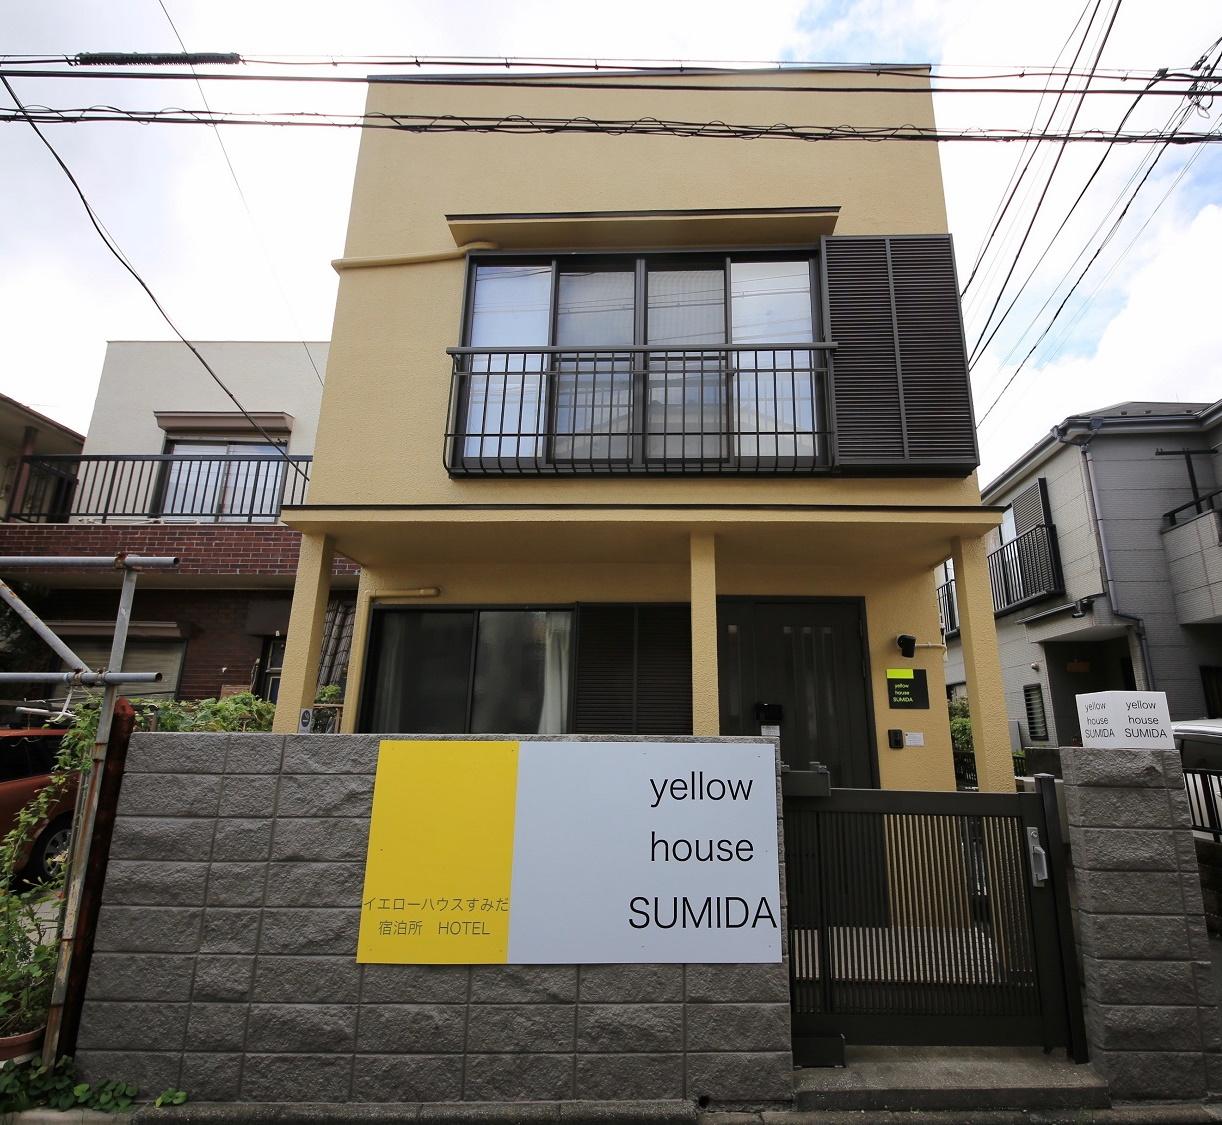 yellow house SUMIDA